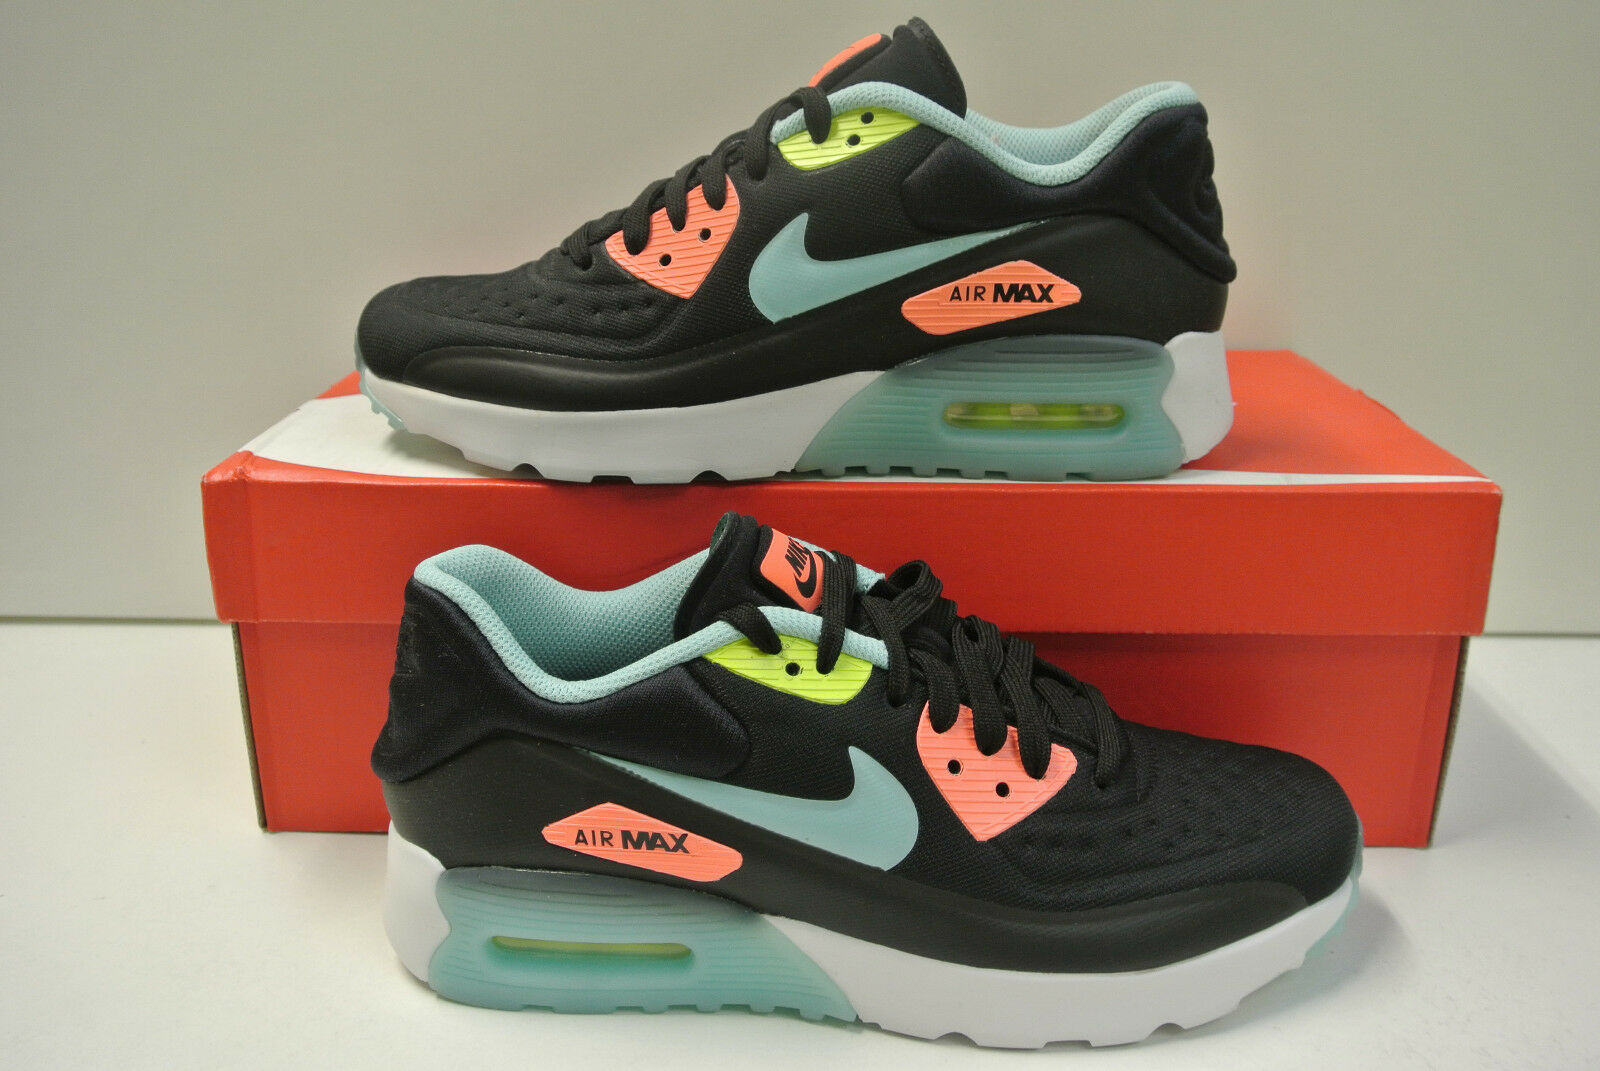 69945fc42dae4 Nike Nike Nike Air Max 90 Ultra SE gr. SéLECTIONNABLE neuf et ...